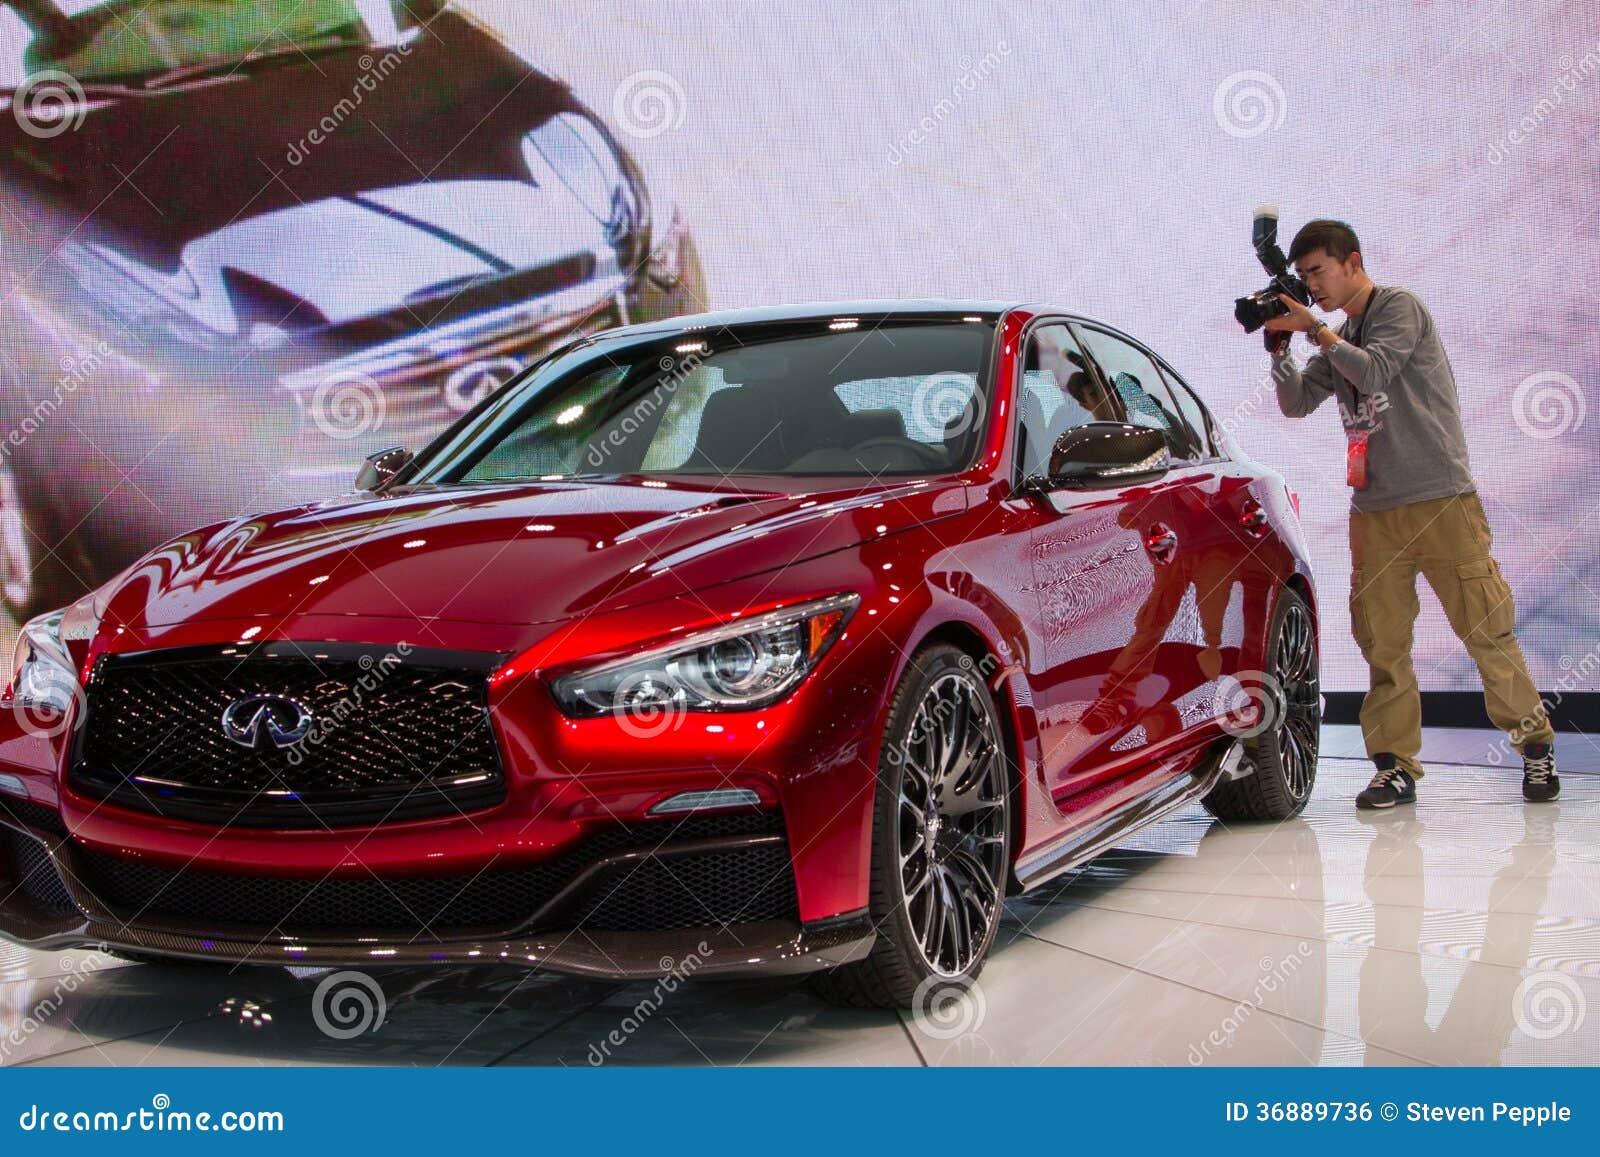 Luxury Vehicle: Infinite Q50 Eau Rouge Concept Car Editorial Photo